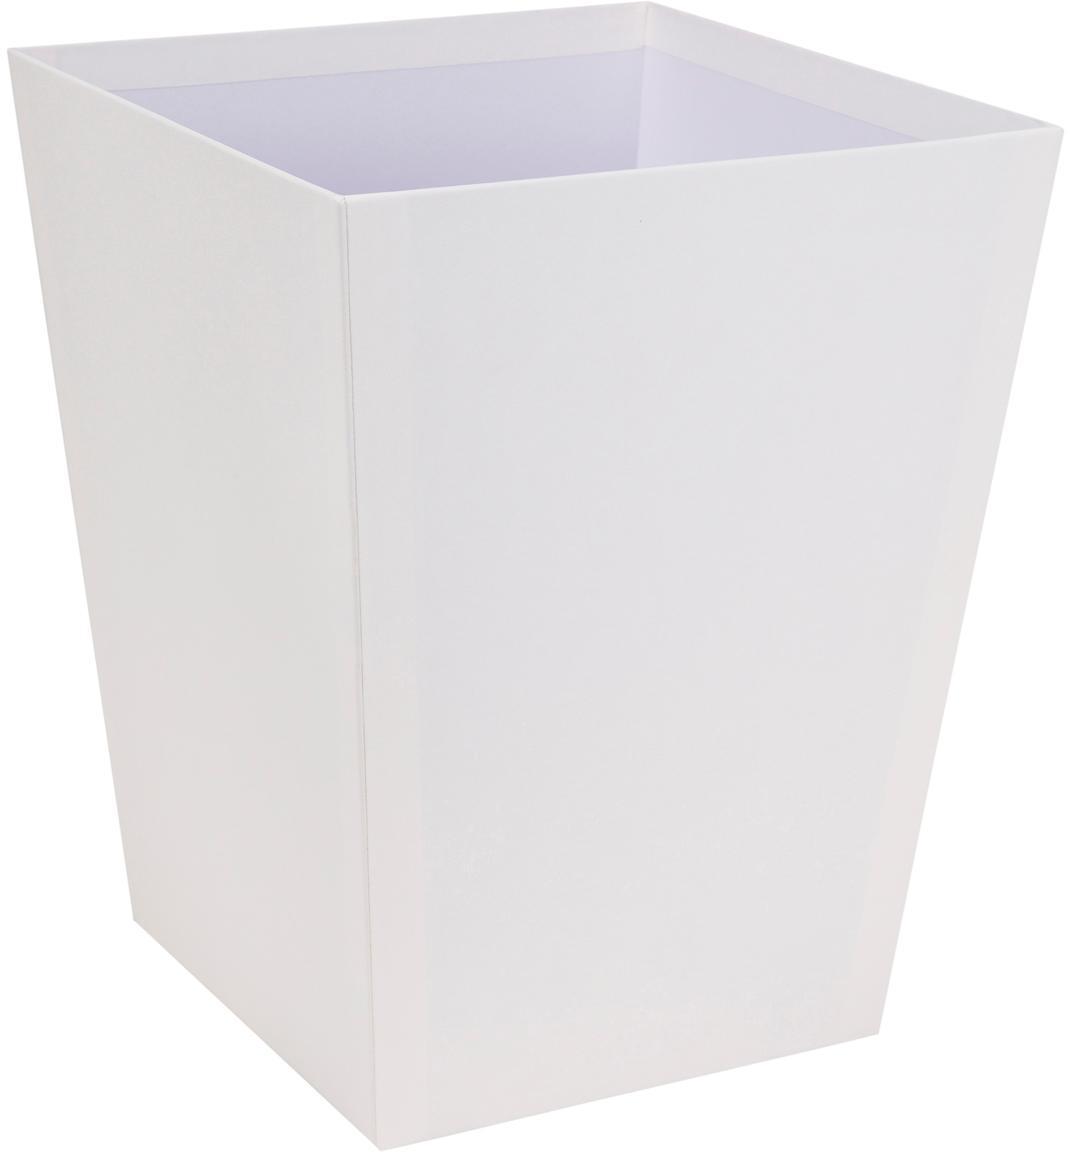 Papelera Sofia, Cartón laminado macizo, Blanco, An 26 x Al 33 cm